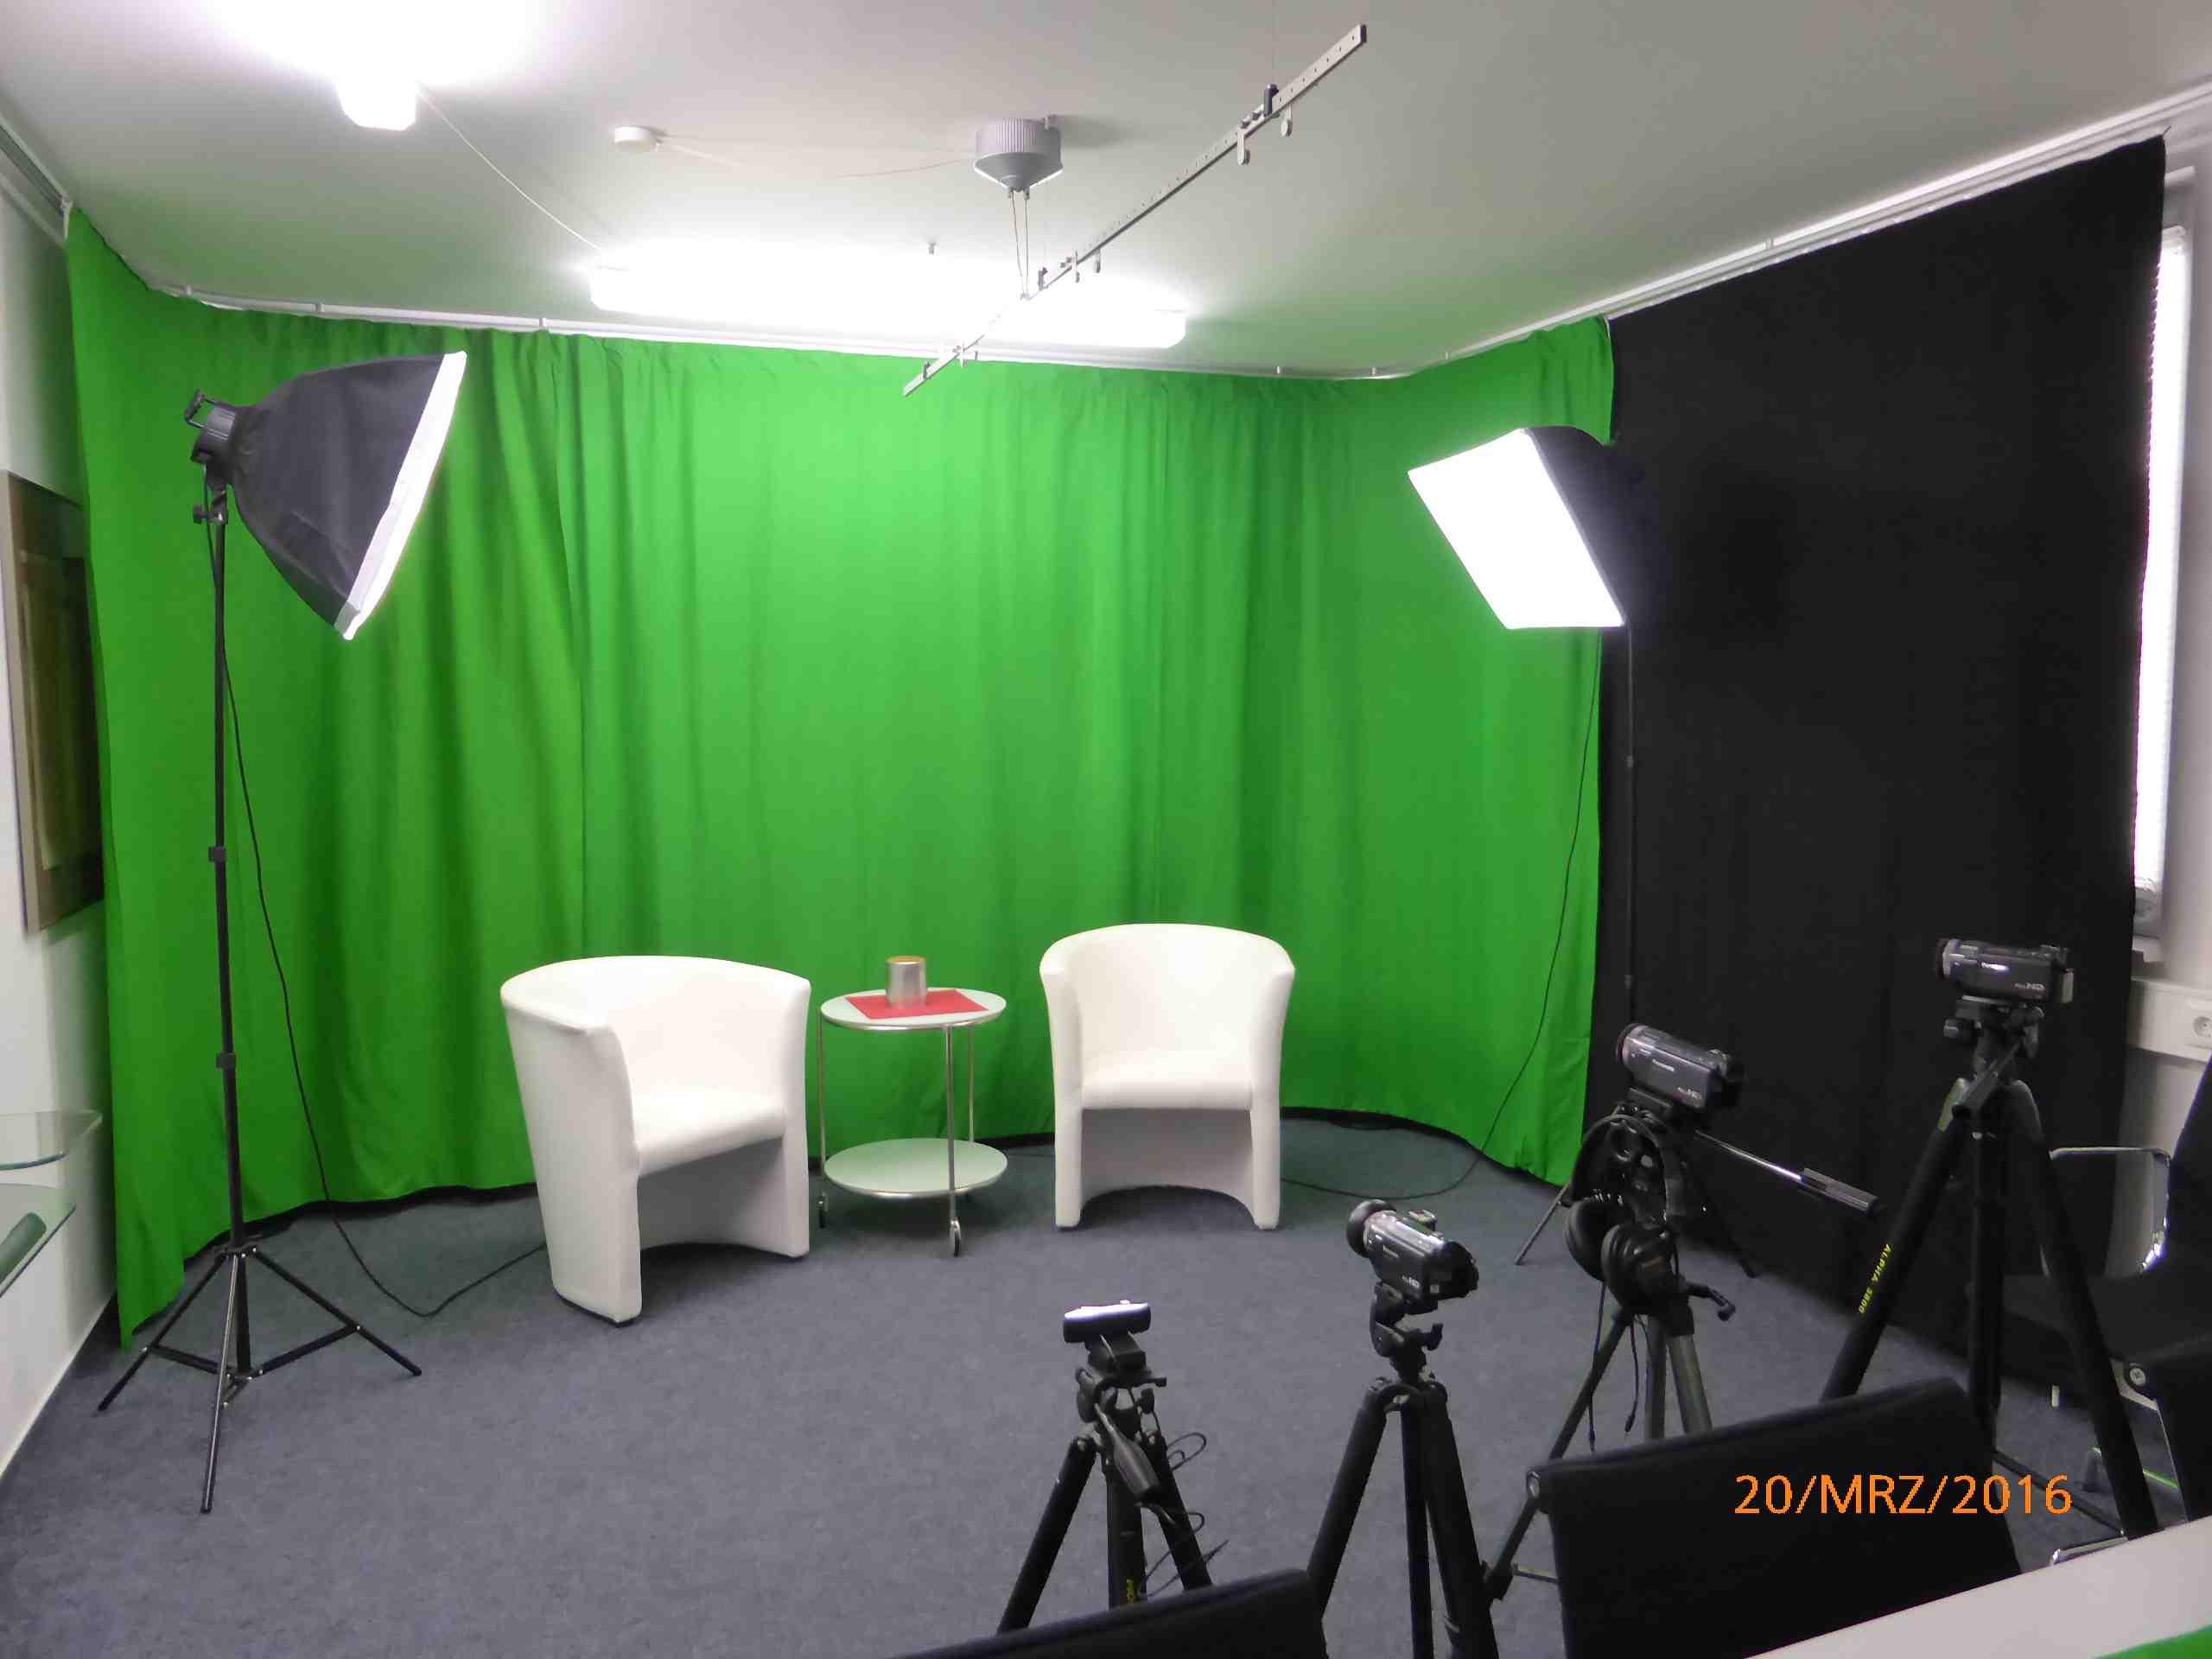 profiTel jetzt mit eigenem Videostudio